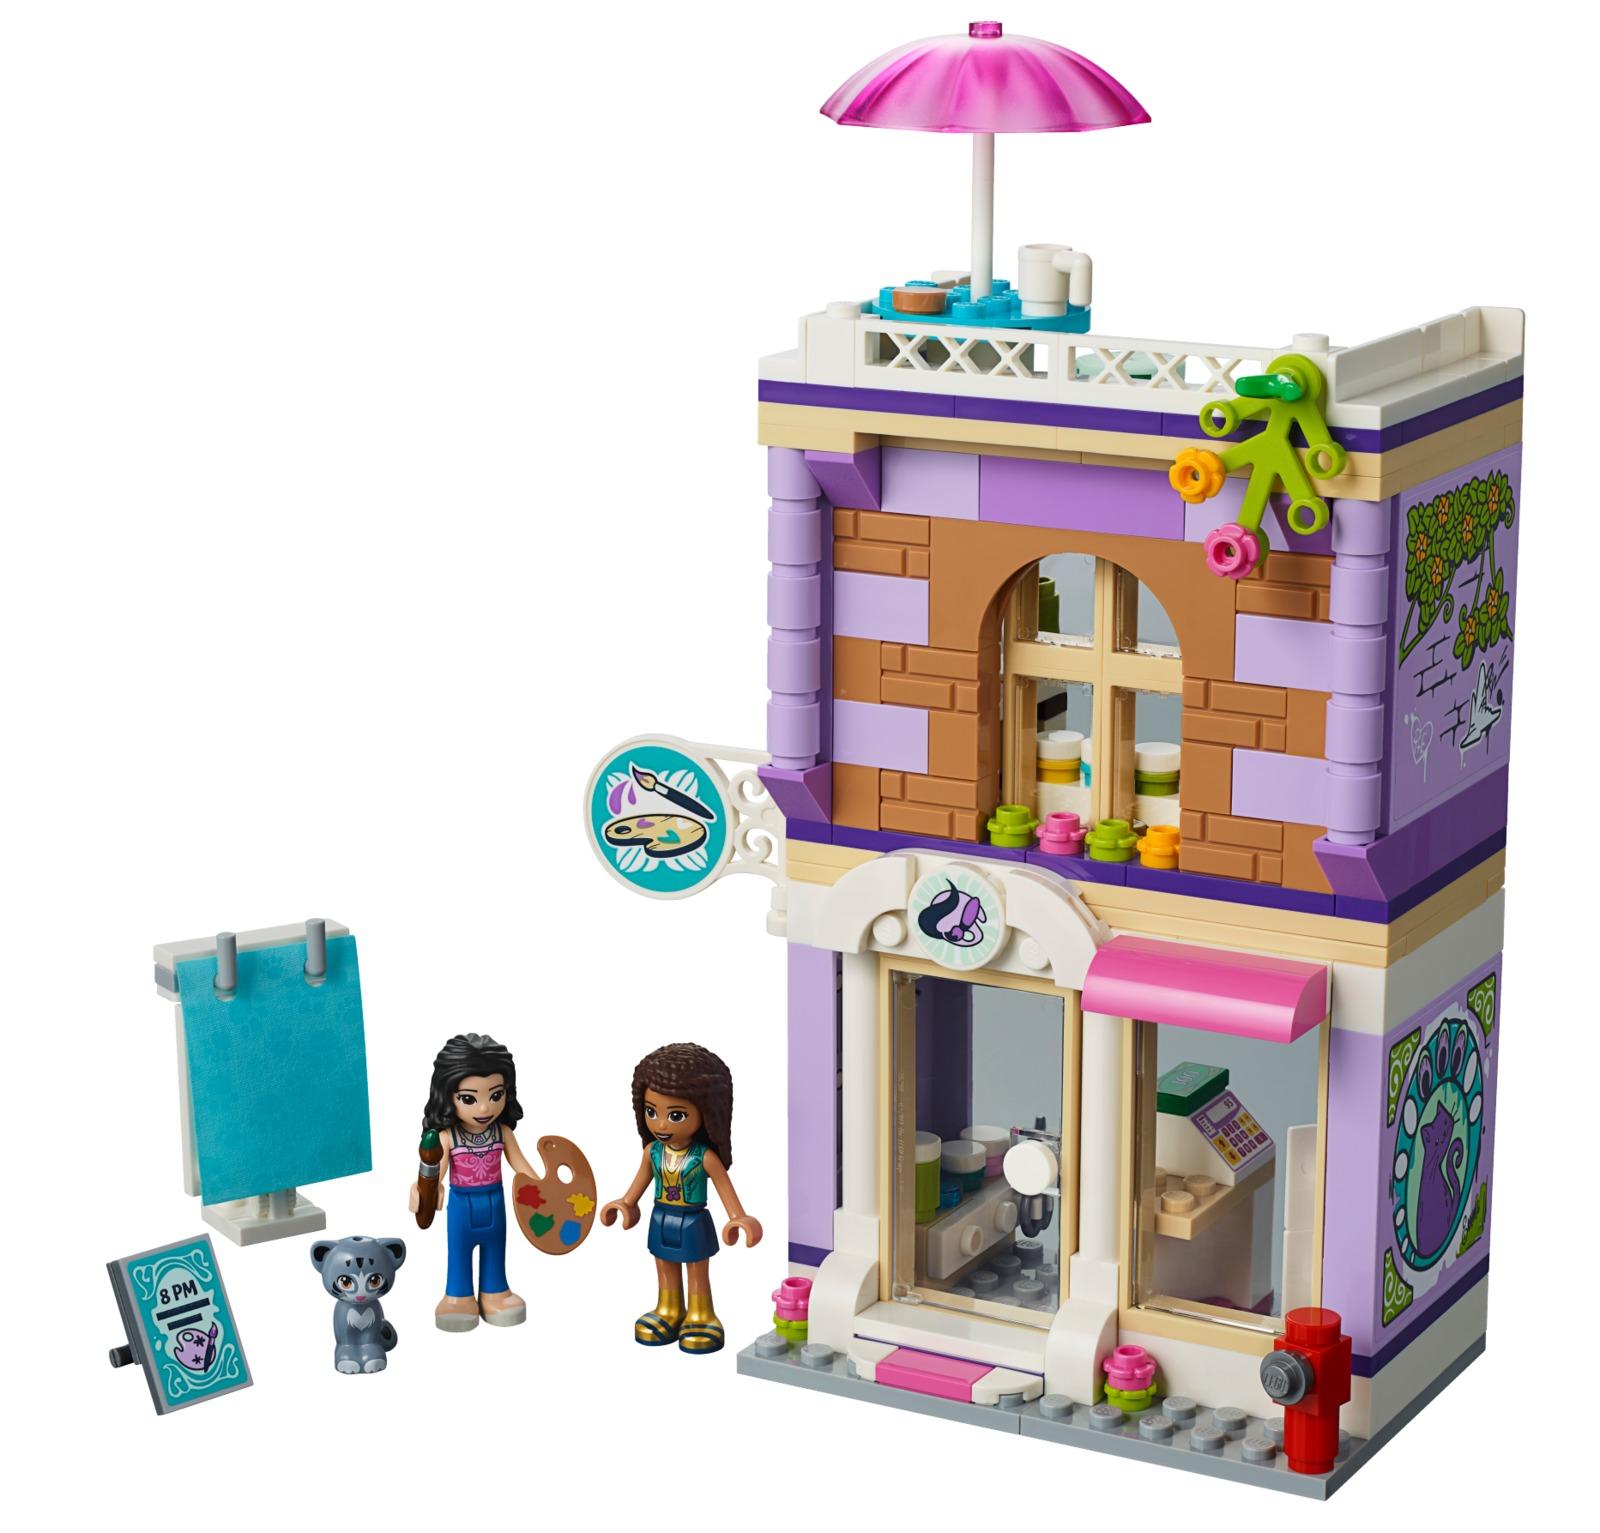 Lego Friends Emmas Art Studio Toy At Mighty Ape Nz